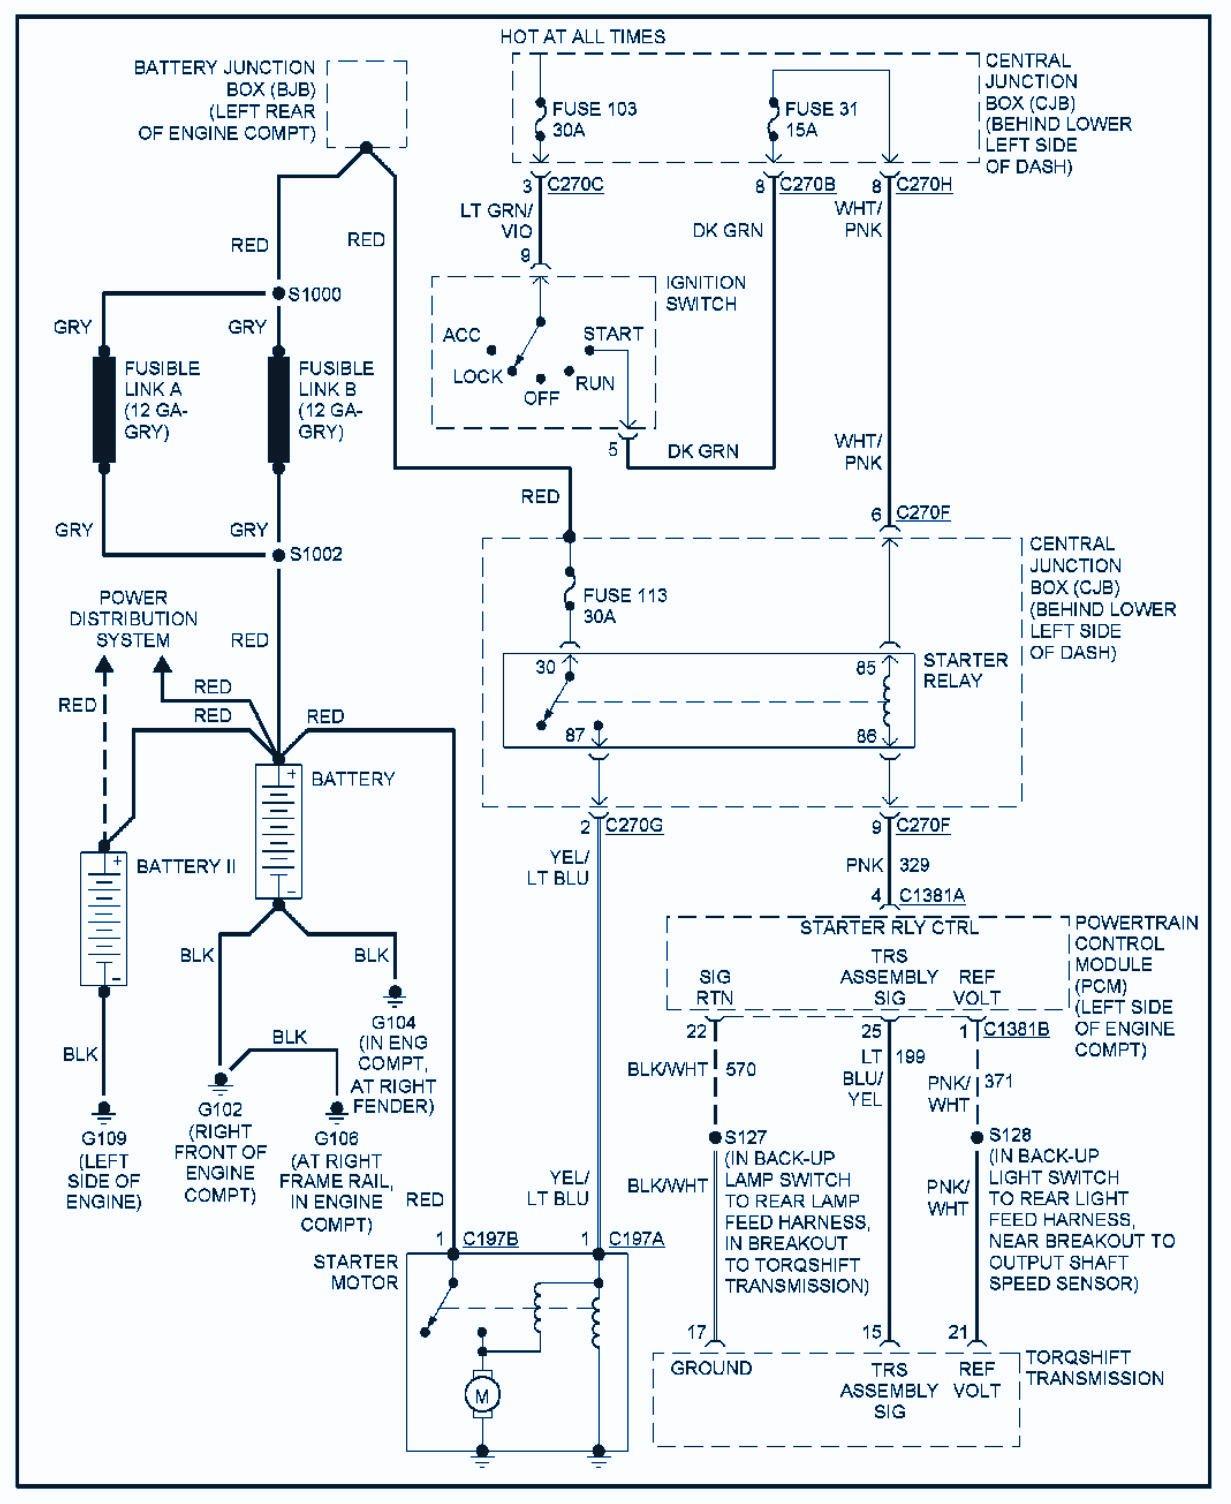 2008 F350 Wiring Diagram - Wiring Diagram •